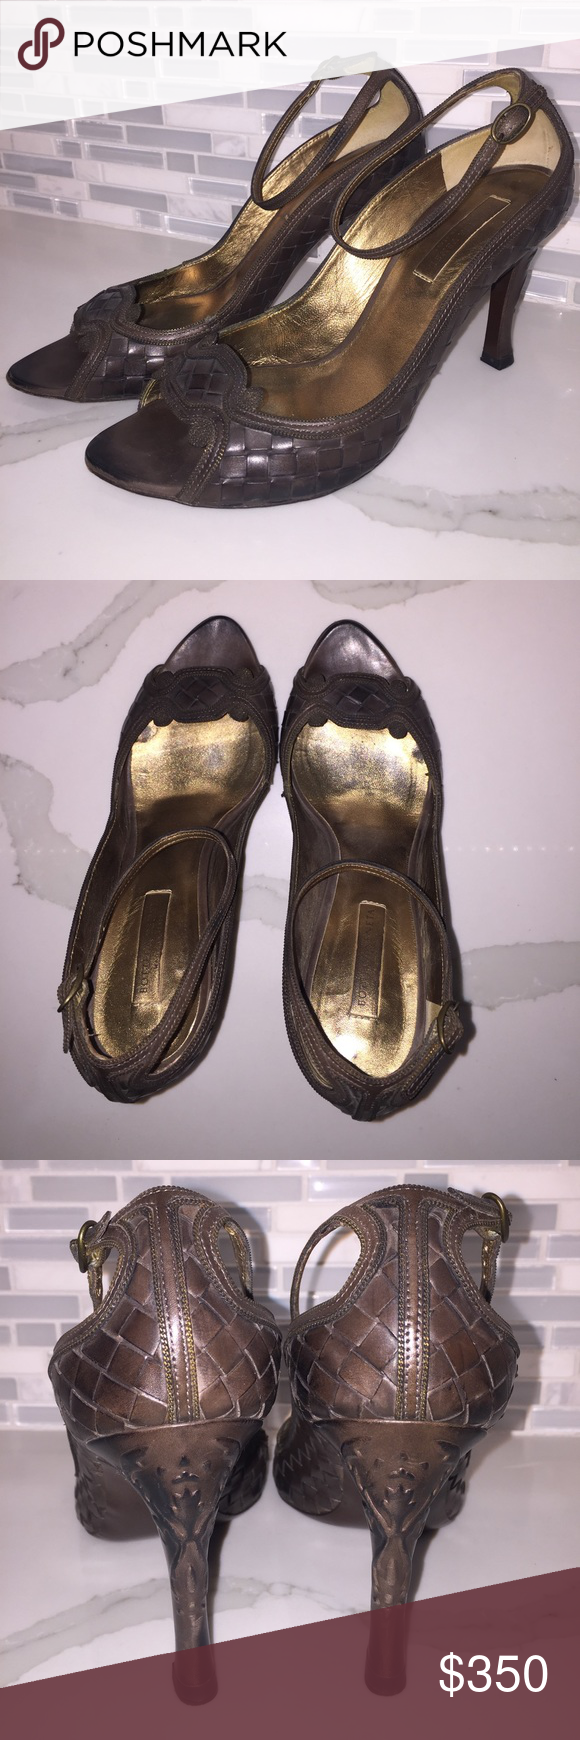 Bottega Veneta heels Beautiful Bottega Brown high heels like new. Bottega Veneta Shoes Heels